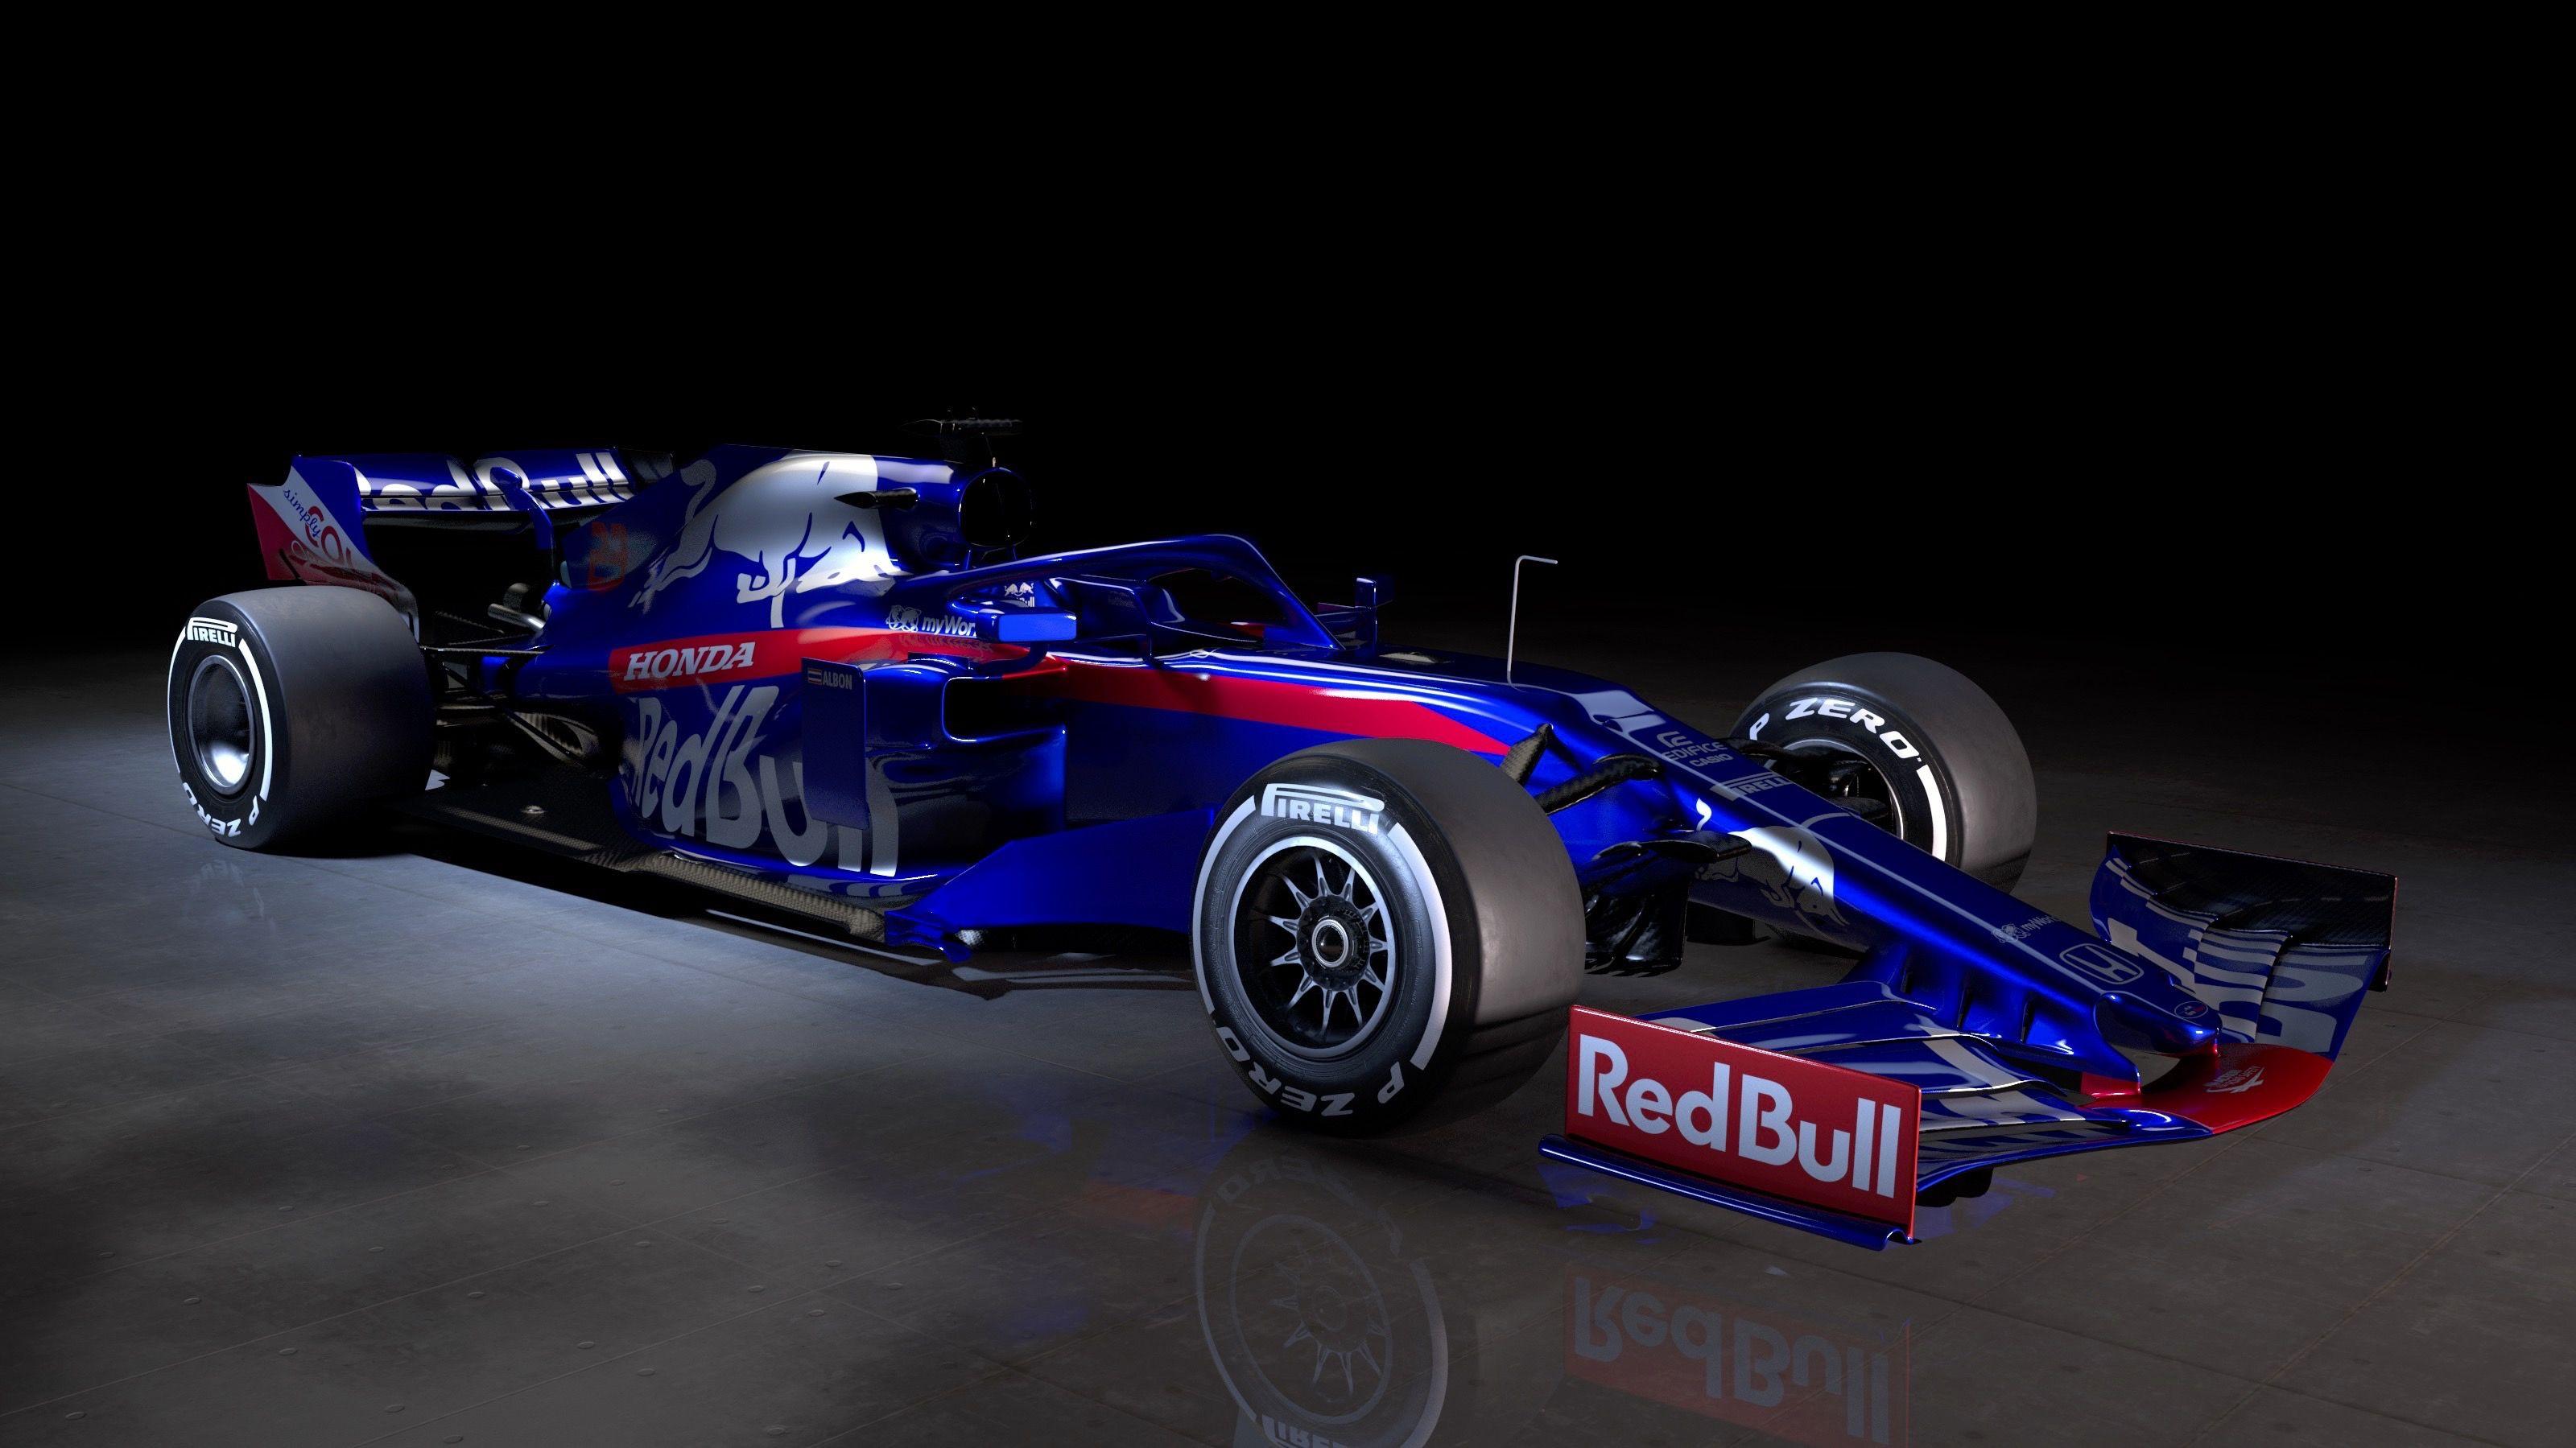 2019 Toro Rosso Str14 F1 Car Launch Pictures F1 Str14 Scuderia Toro Rosso Toro Rosso Racing Race Cars